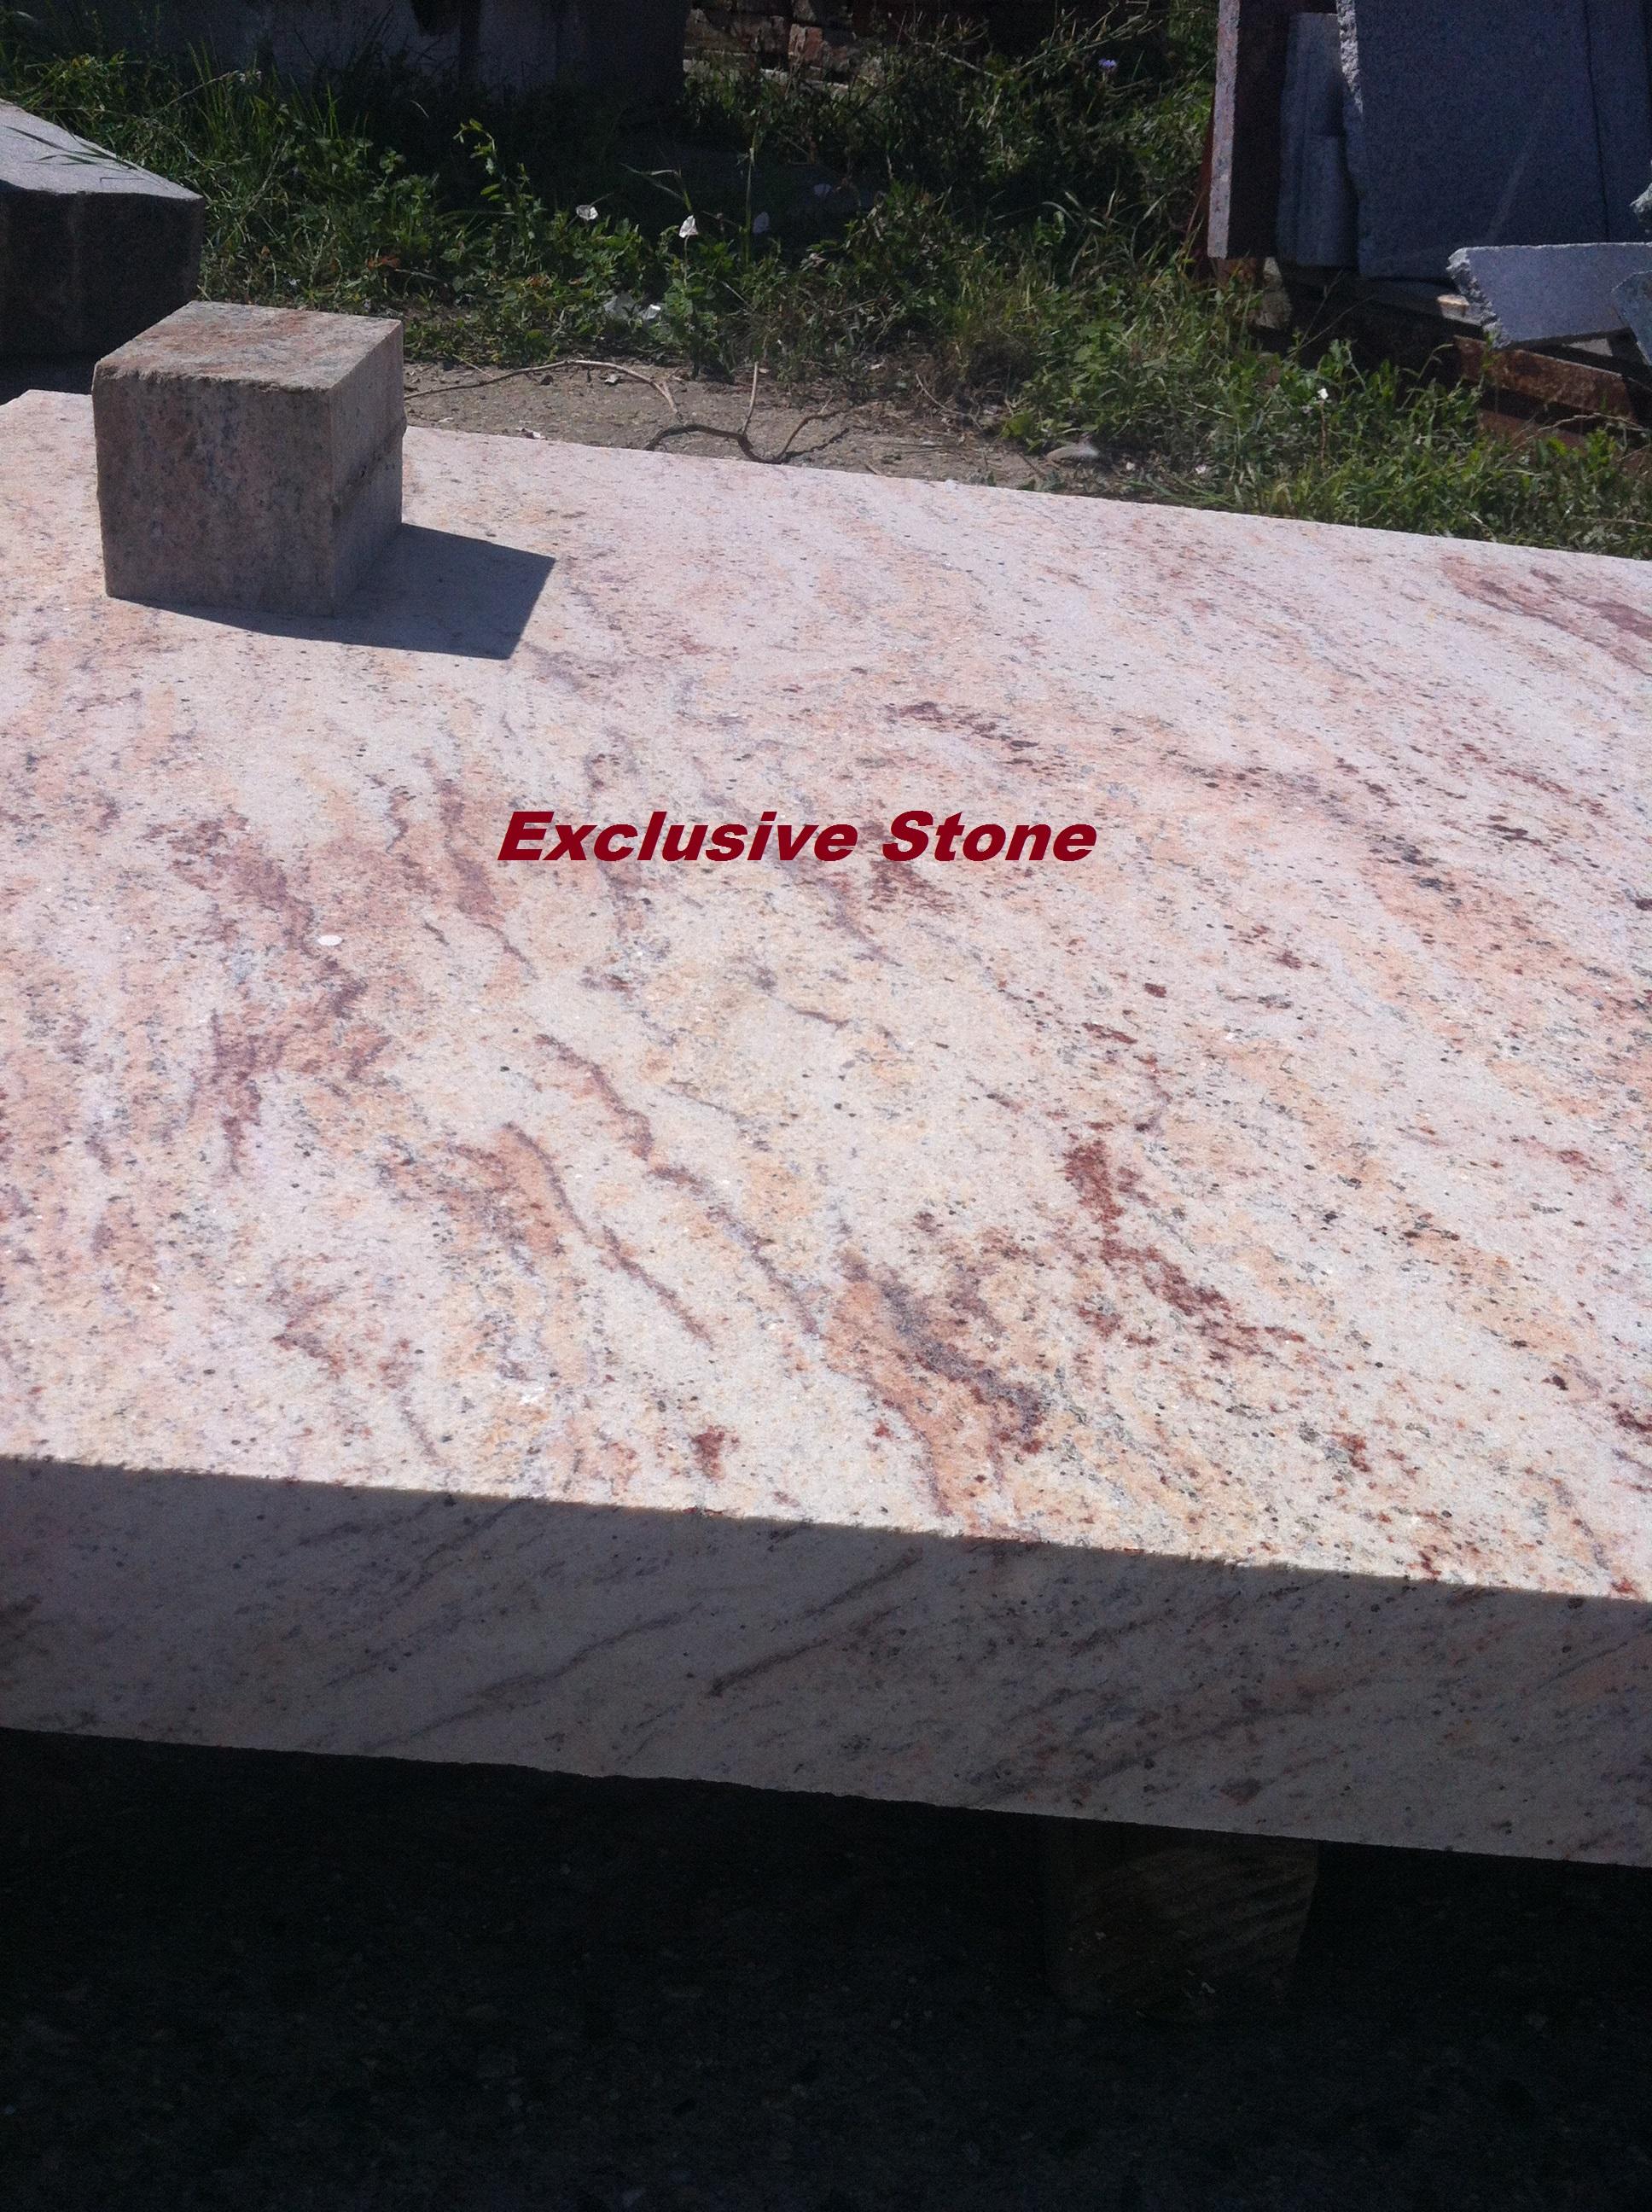 Piese /masive Granit Shivakashicu grosimi de 2, 3, 4, 8 , 10 cm